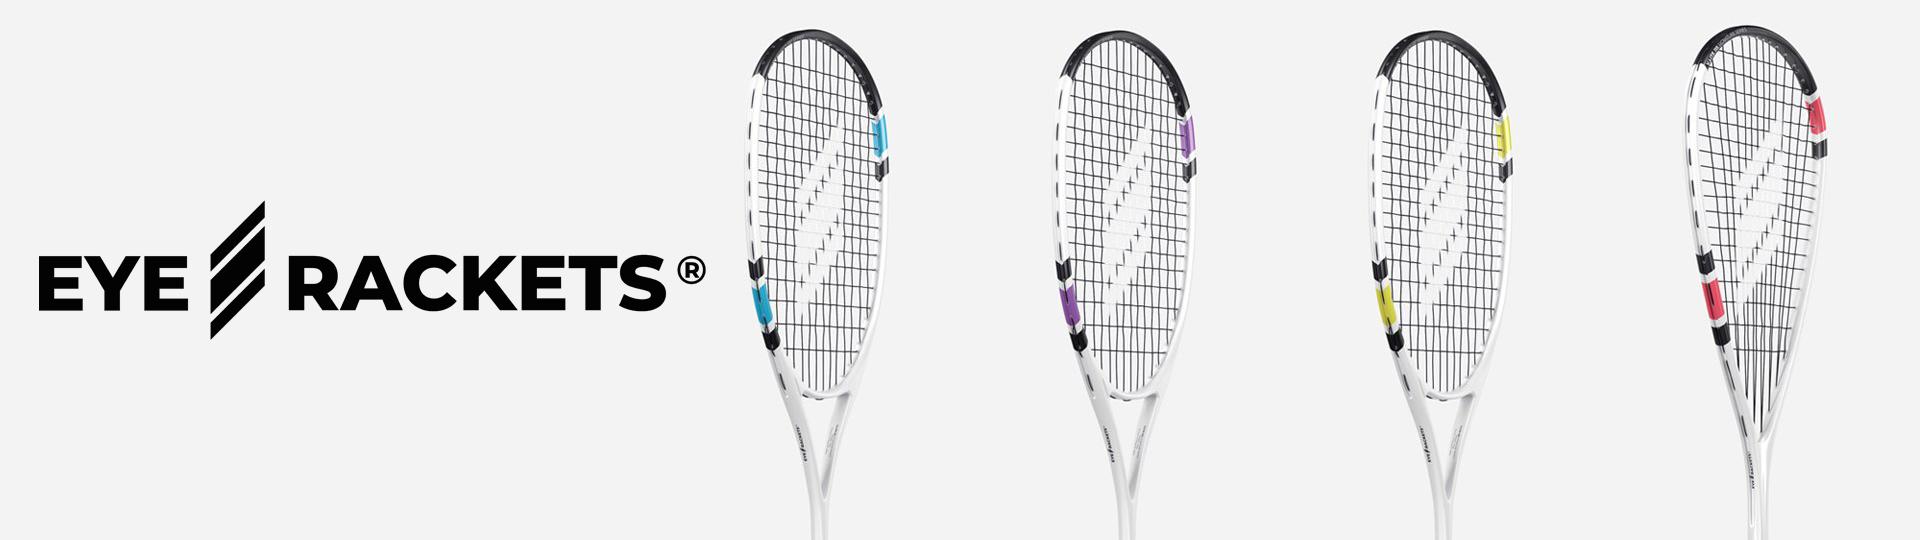 eye-rackets-squash-racquets-brand-2021.jpg